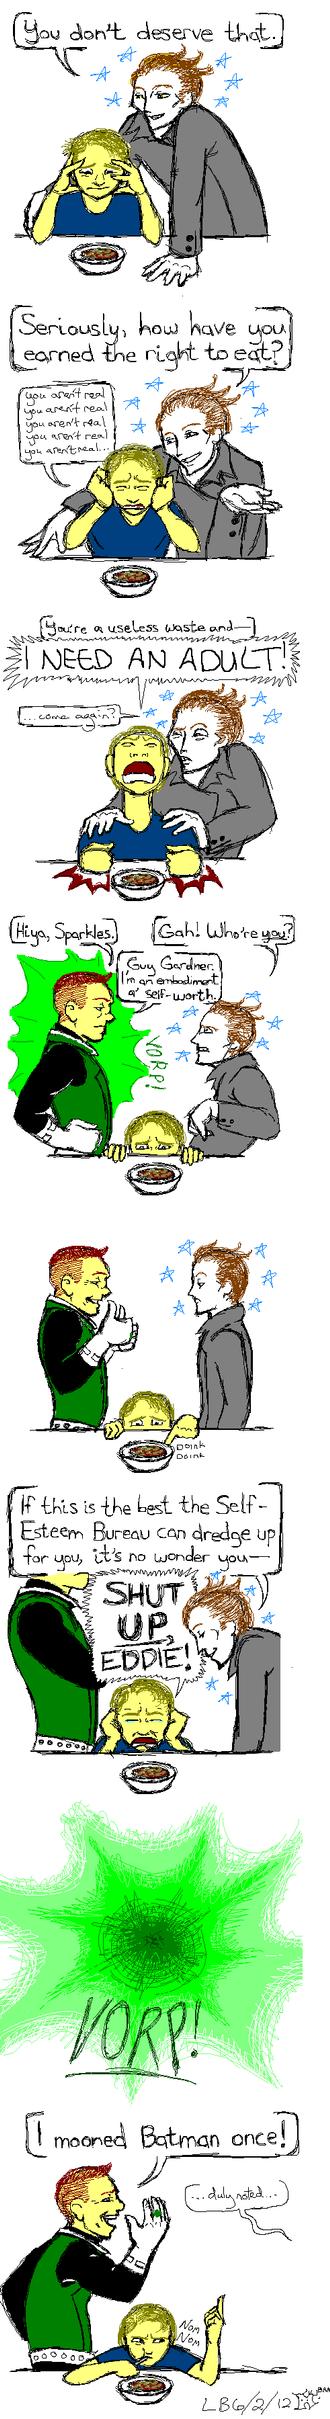 Edward Cullen Adventures pg. 3 by BaaingTree